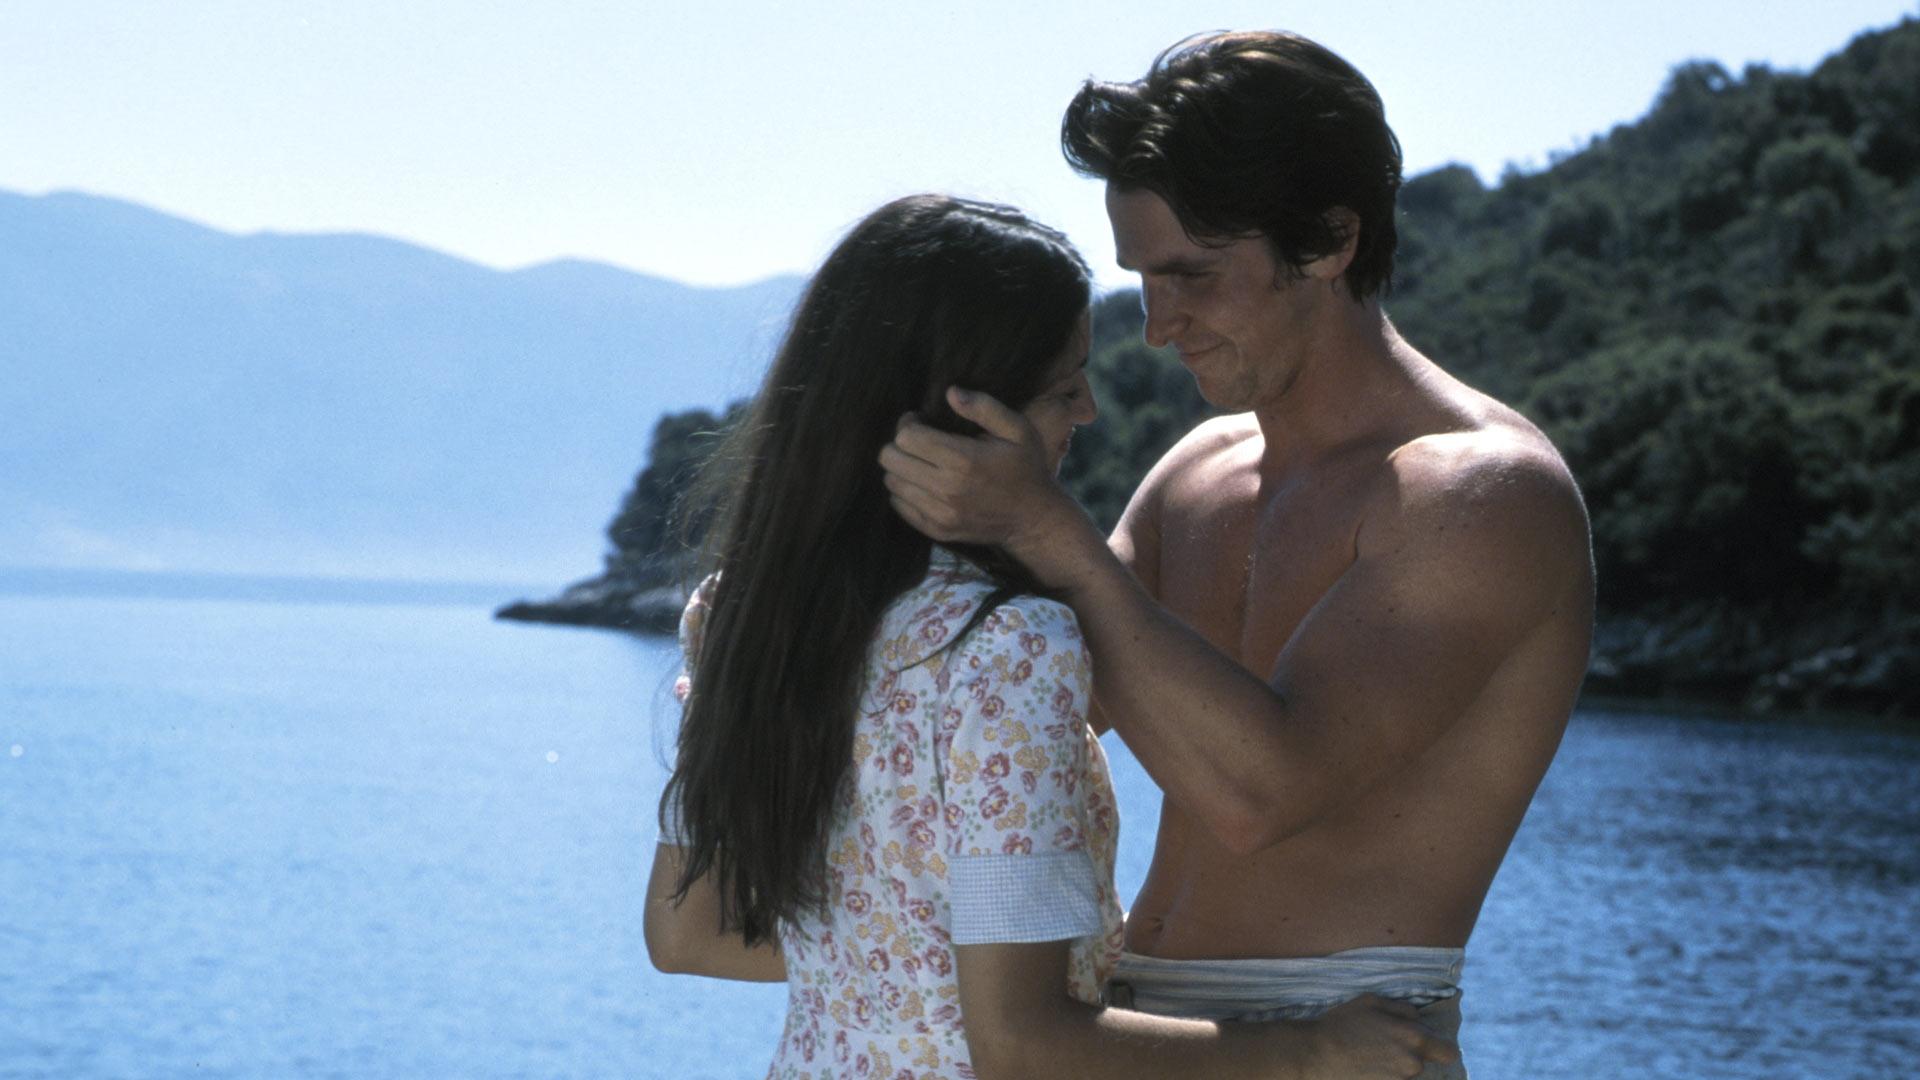 Penelope Cruz ja Christian Bale elokuvassaKapteeni Corellin mandoliini.